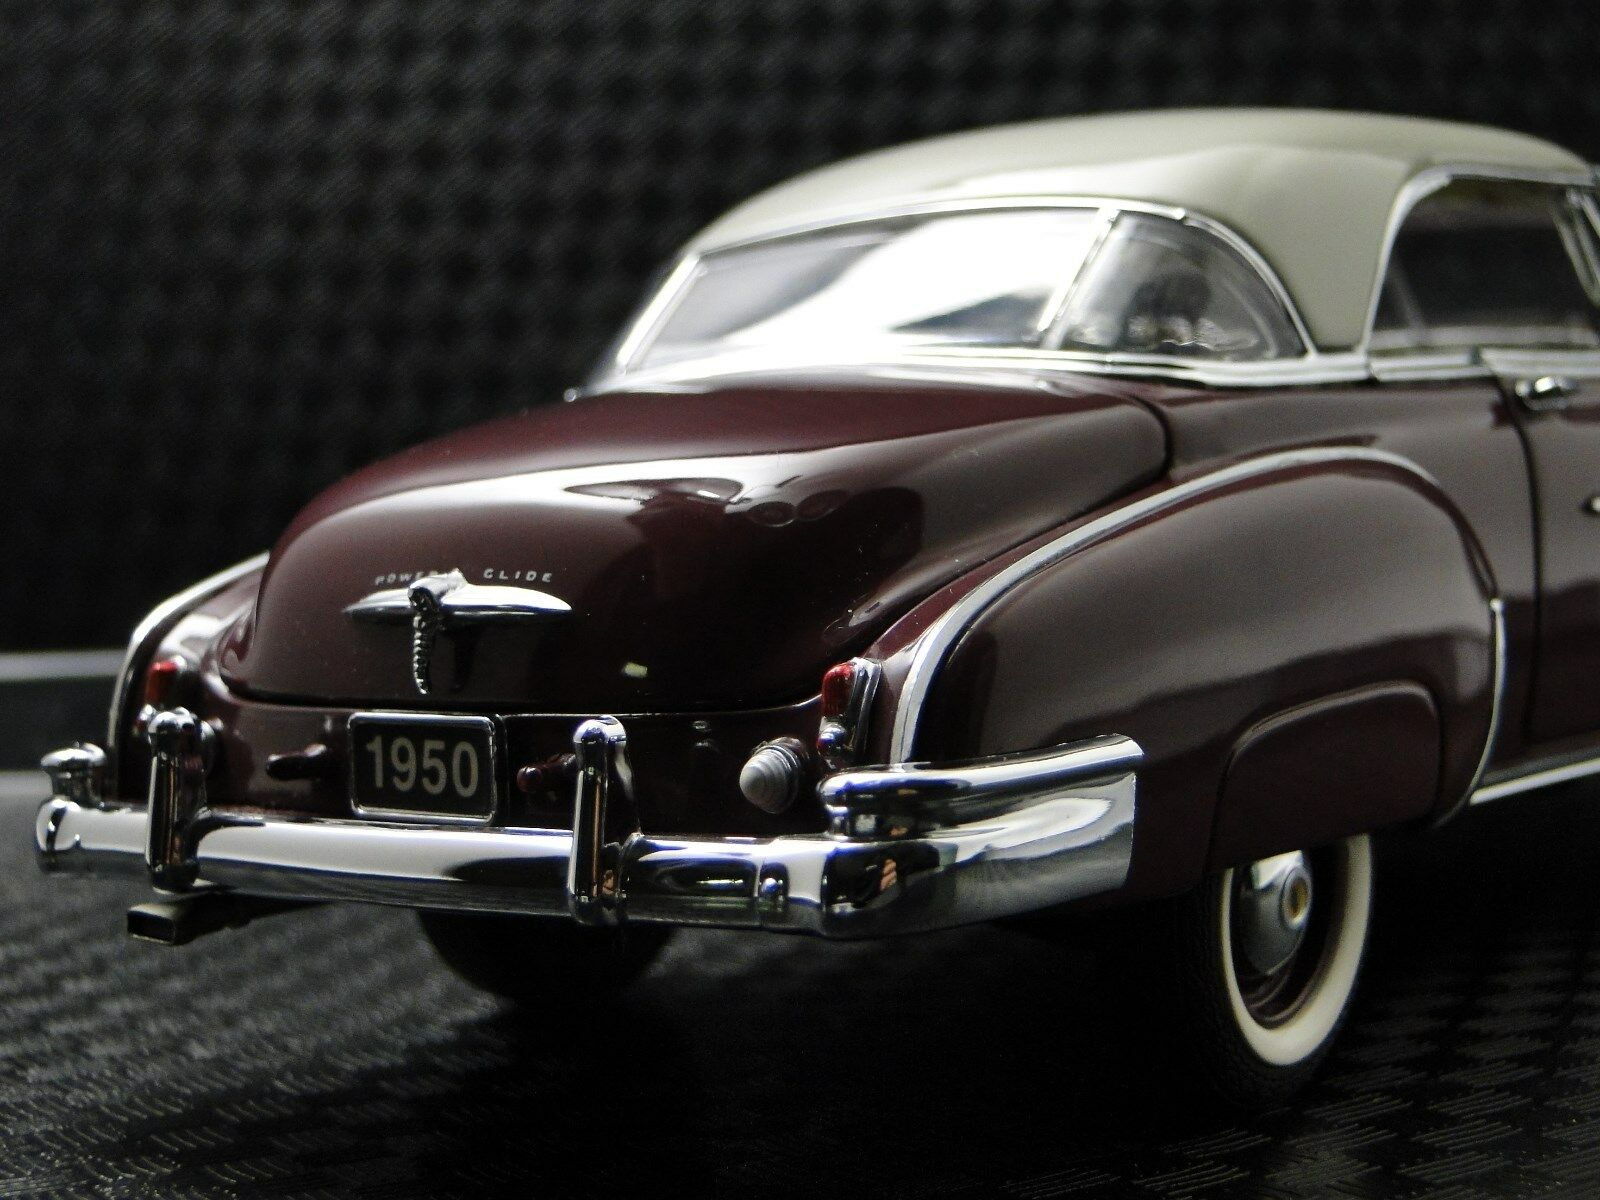 1950s Chevy Bel Air Car 1 Belair 64 Chevrolet 43 43 43 Vintage 24 Metal 18 Model 12 2ce42b